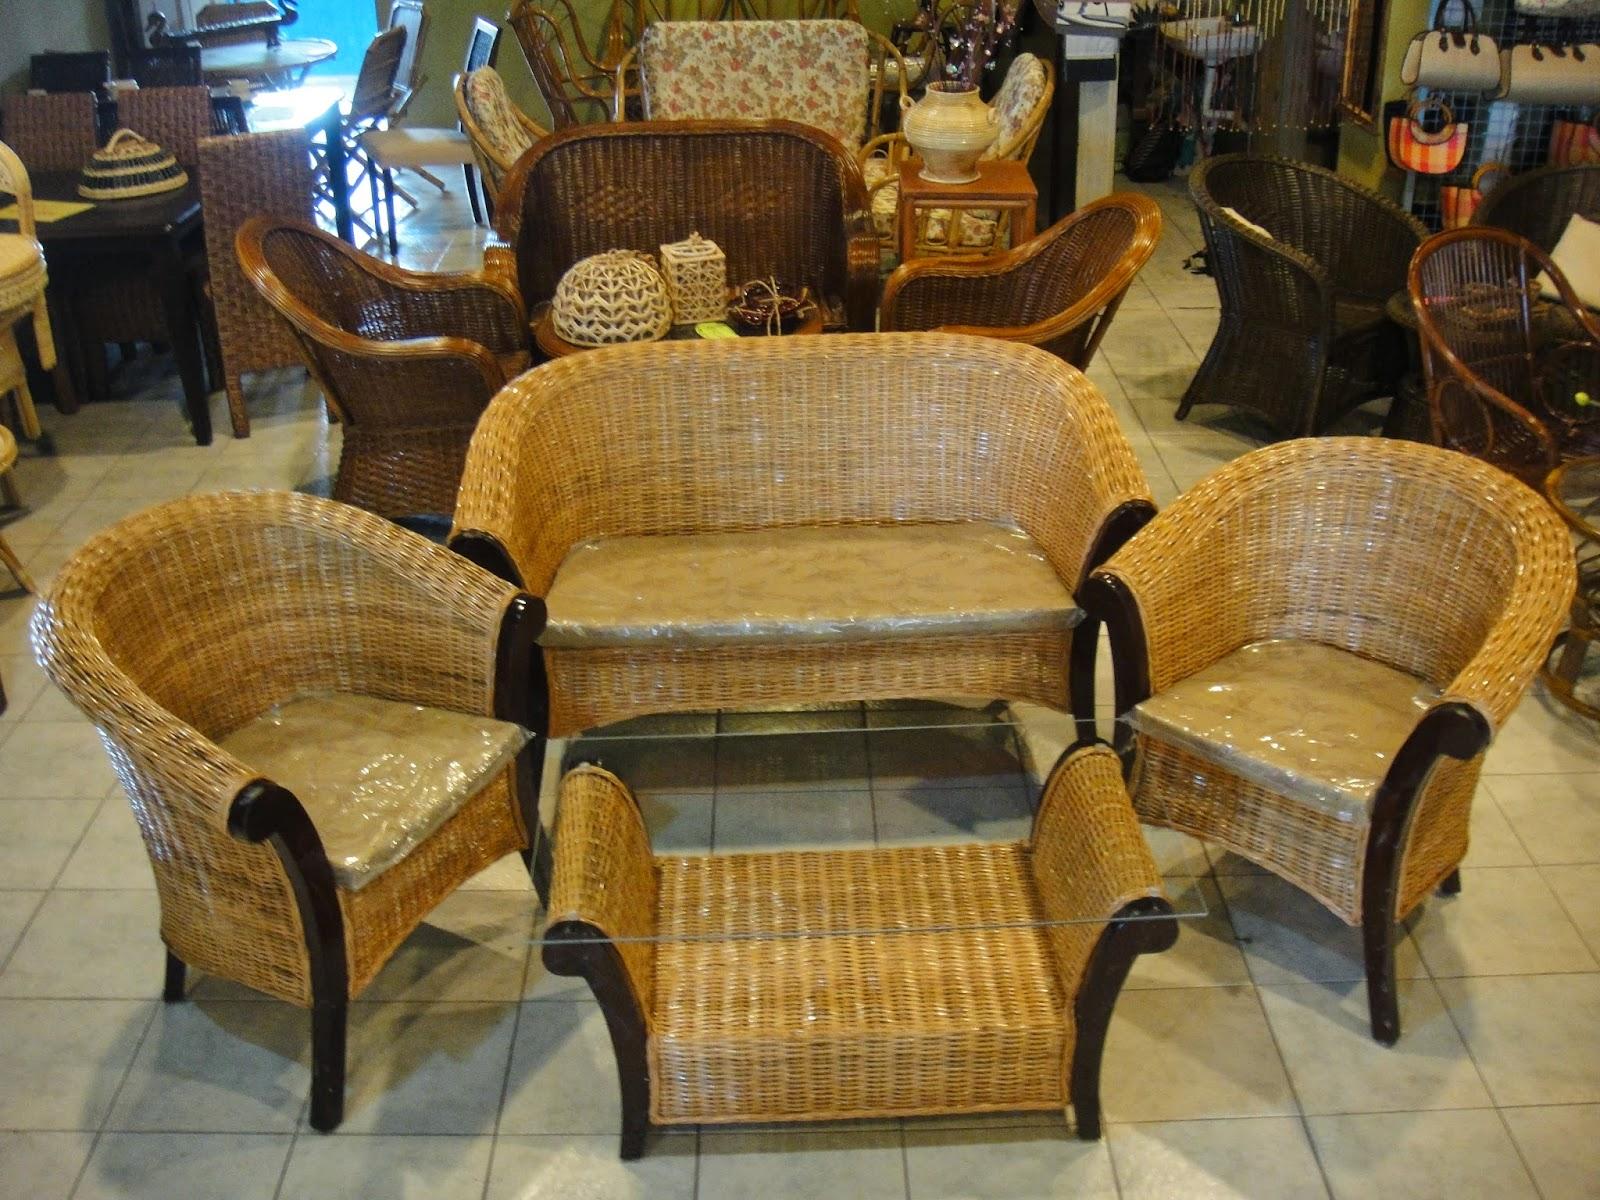 Repair Rattan Furniture Rattan Sofa Cane Wicker Chair Wood